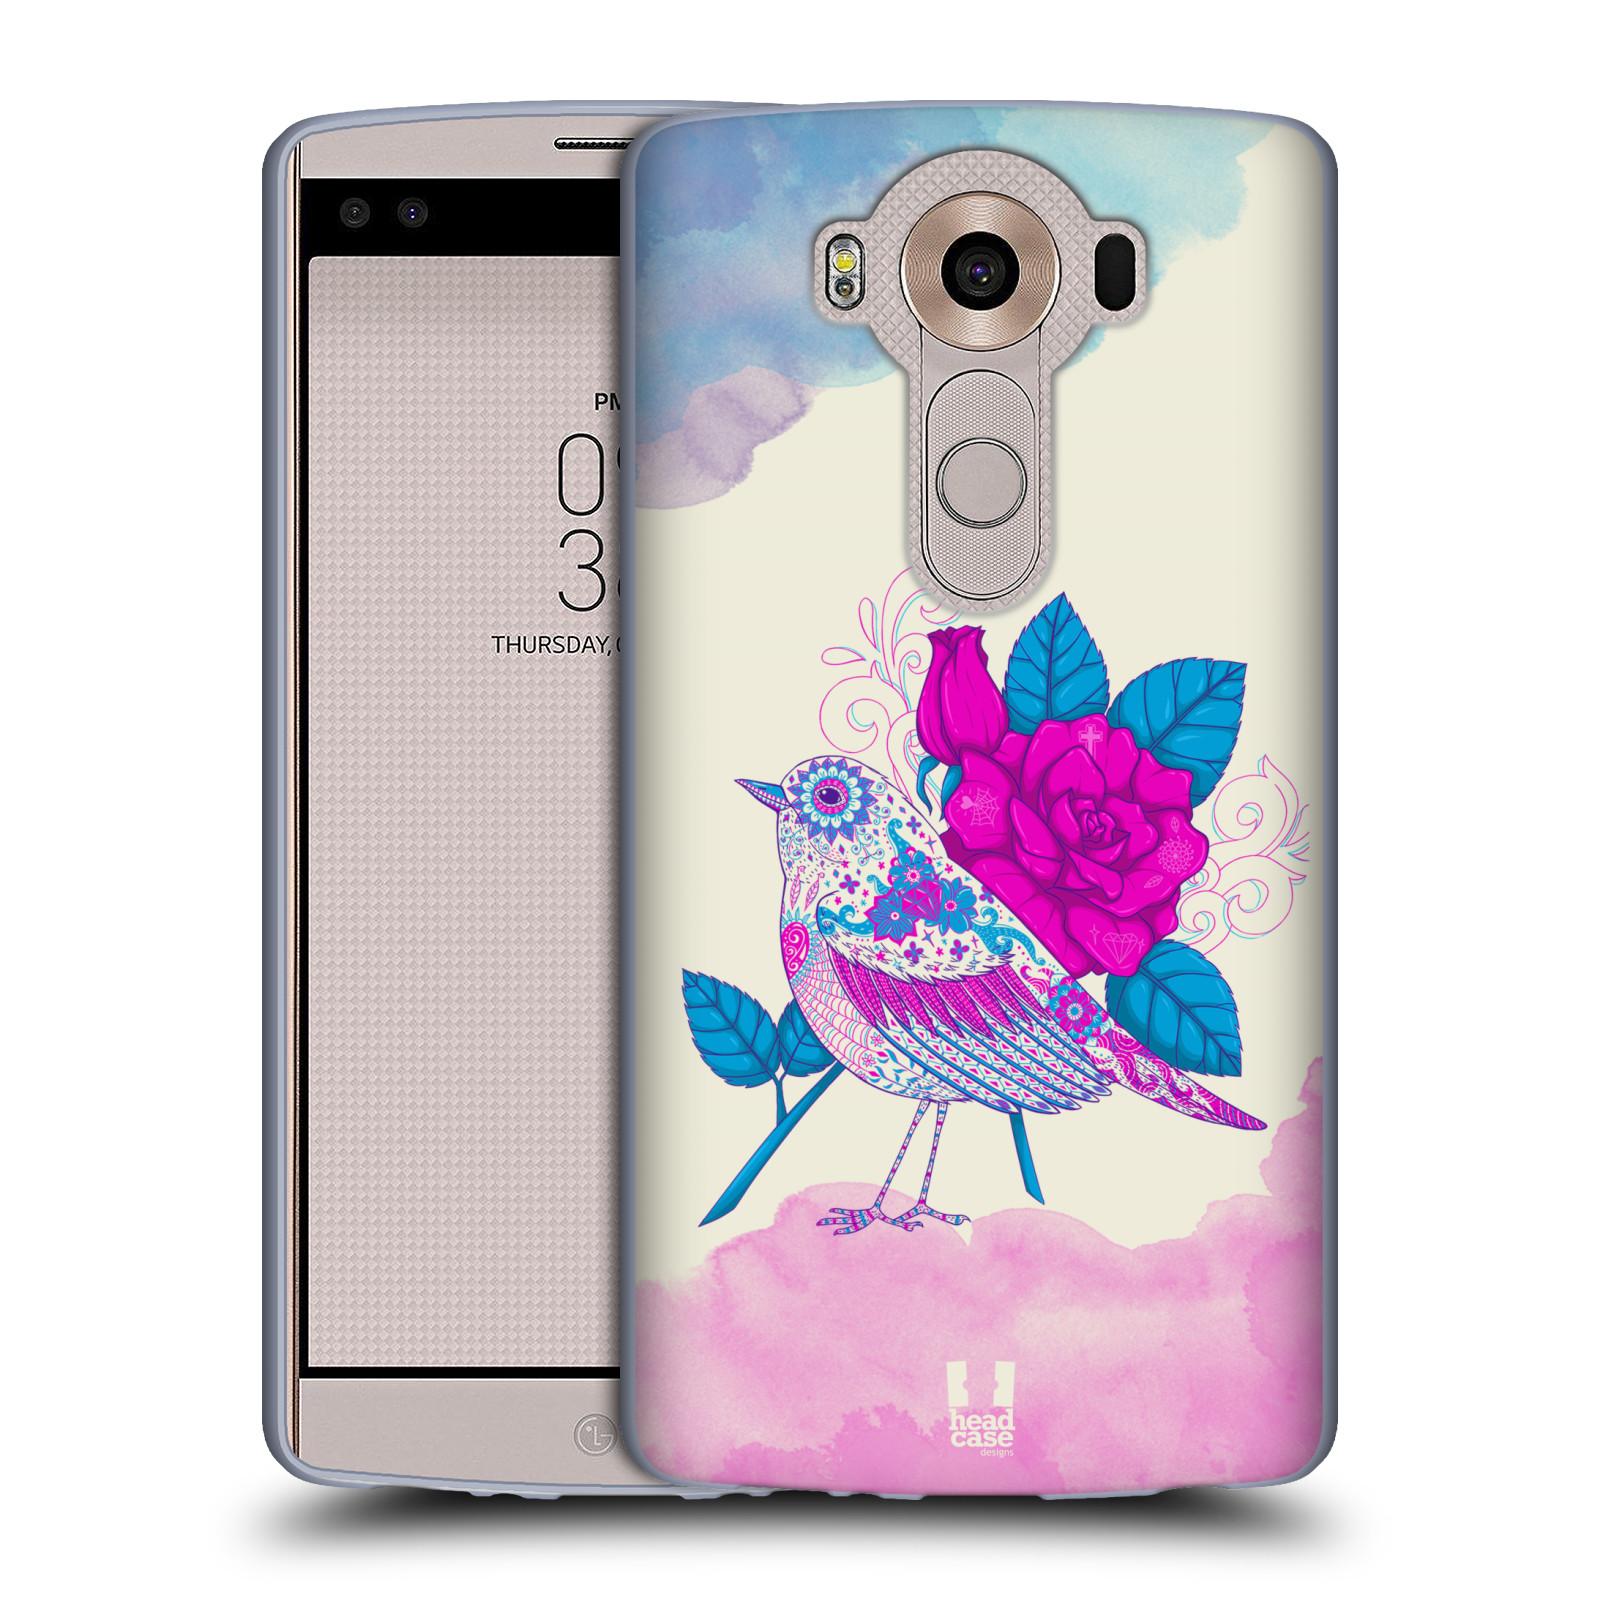 HEAD CASE silikonový obal na mobil LG V10 (H960A) vzor Květina ptáčci FIALOVÁ